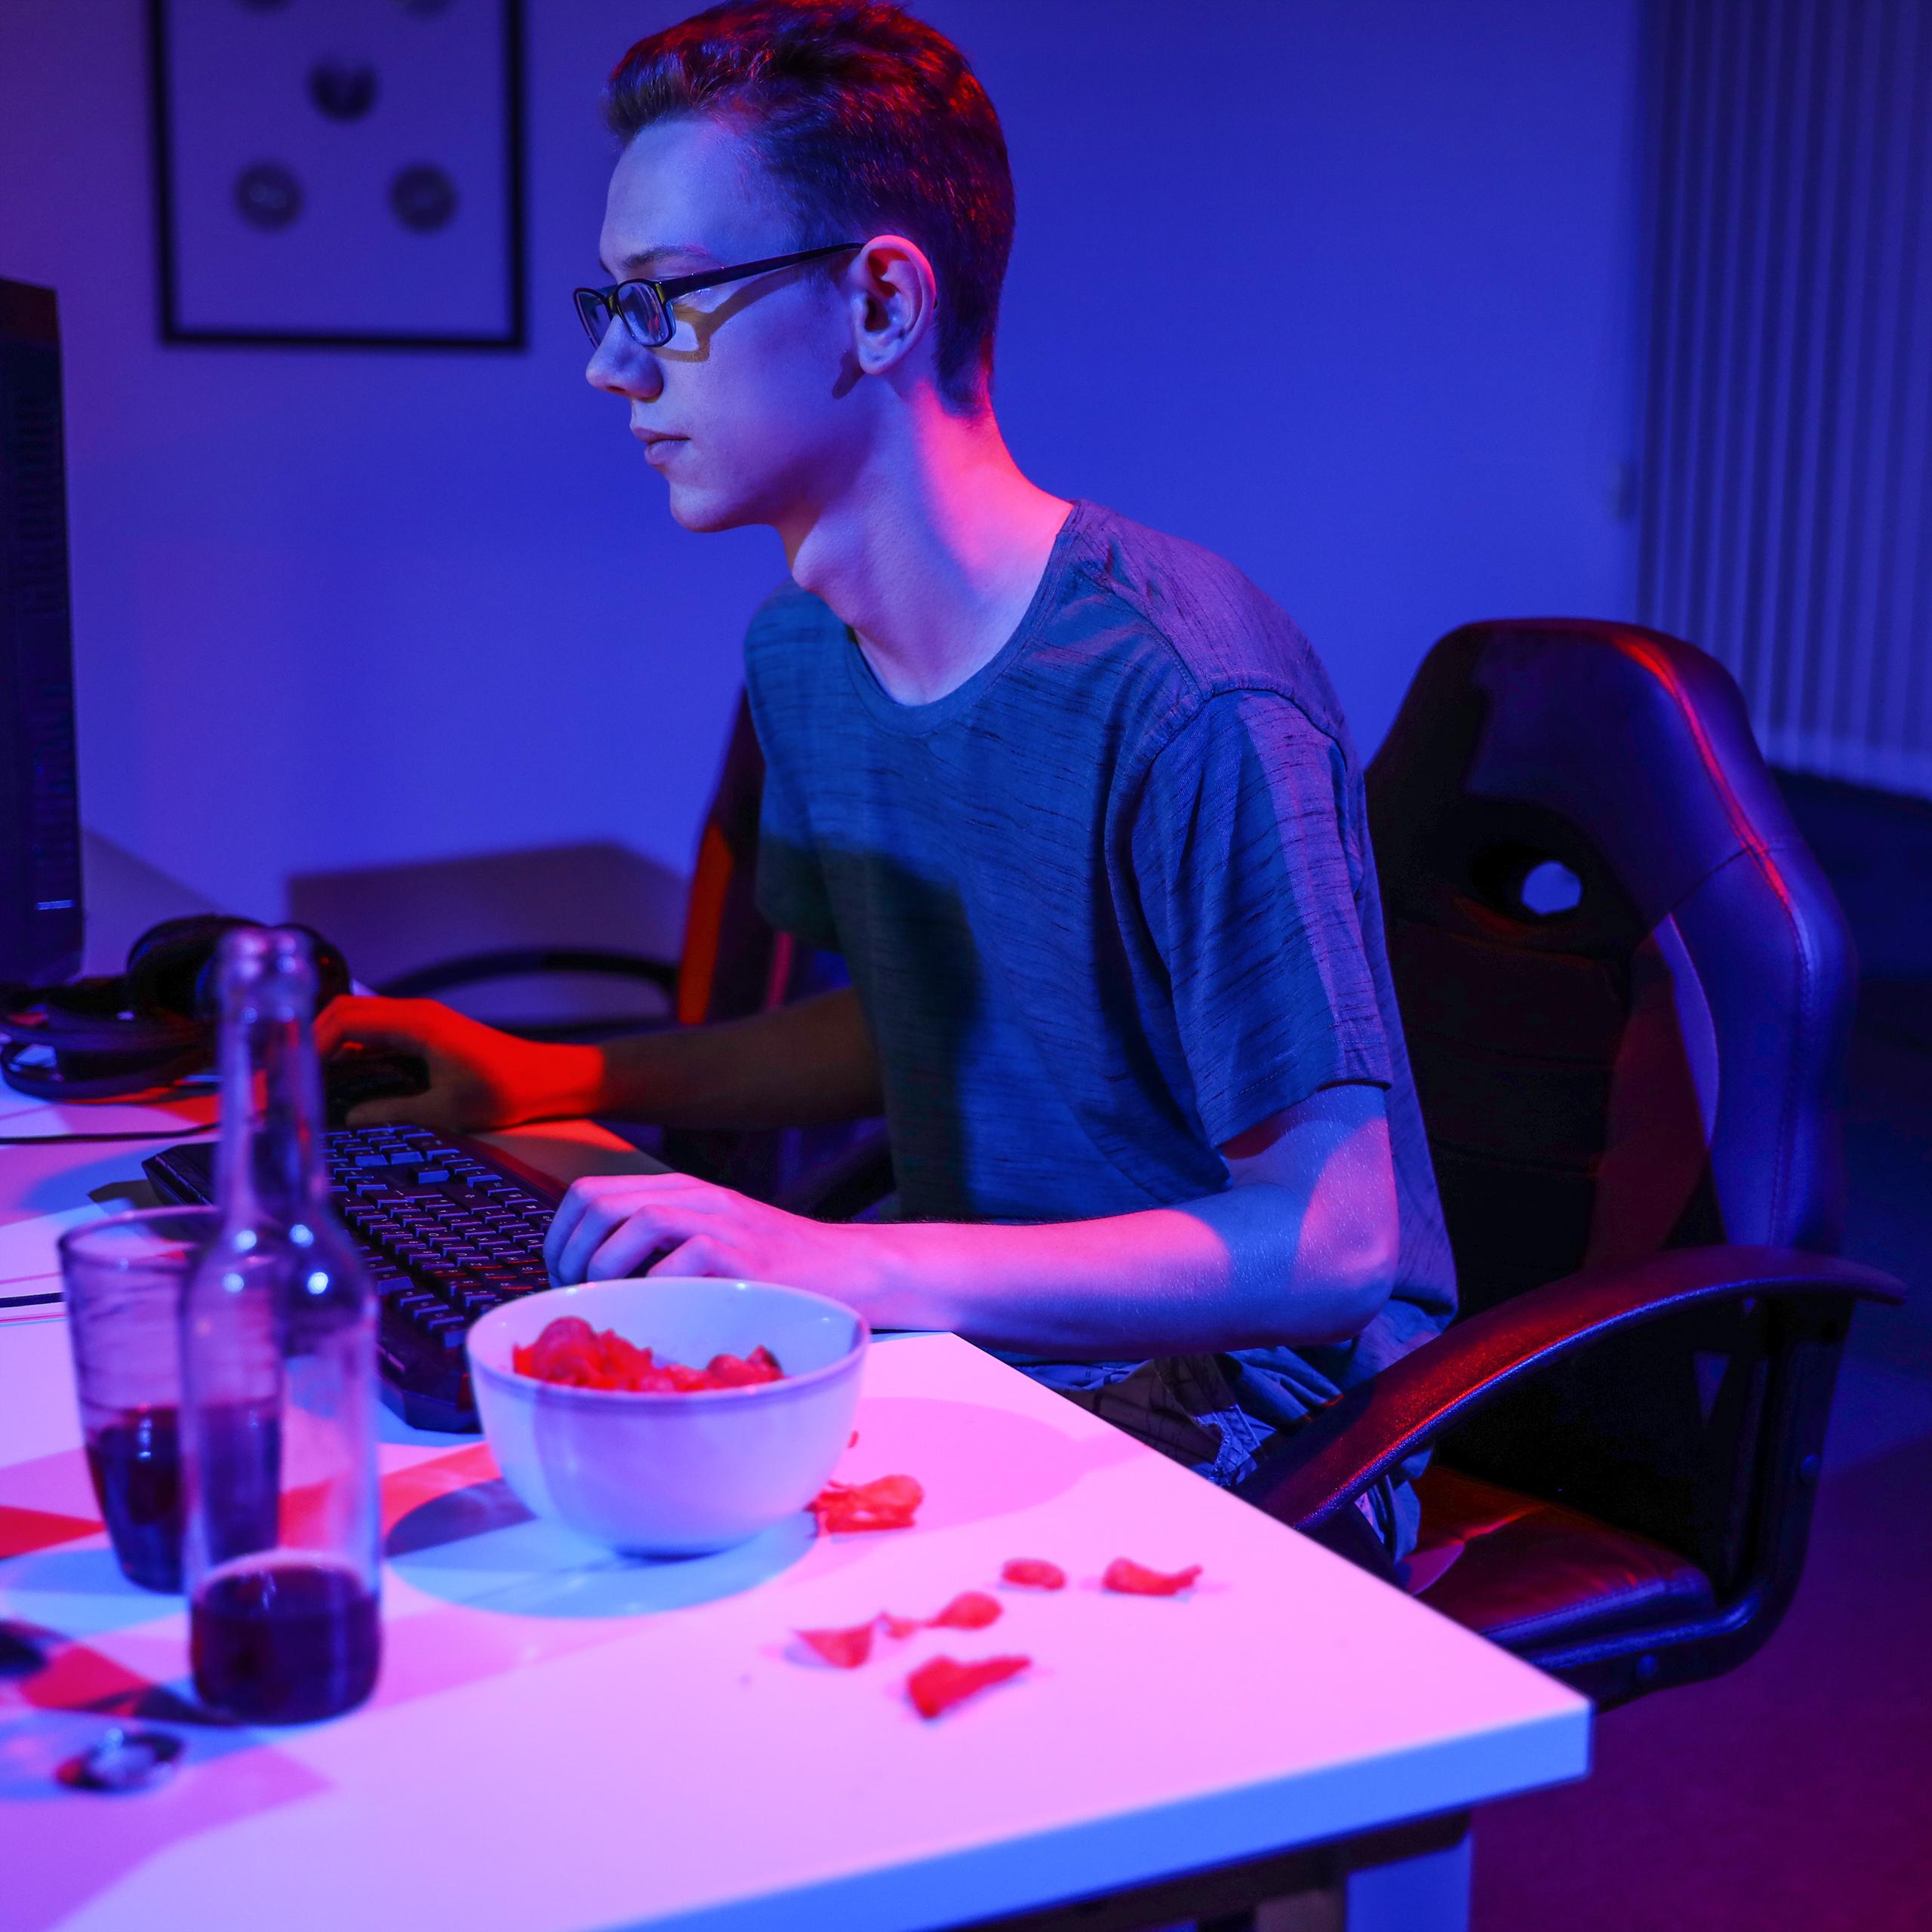 Drehstuhl Racer Bürostuhl PC Gaming Gaming Stuhl XR7 individuelle Sitzhöhe